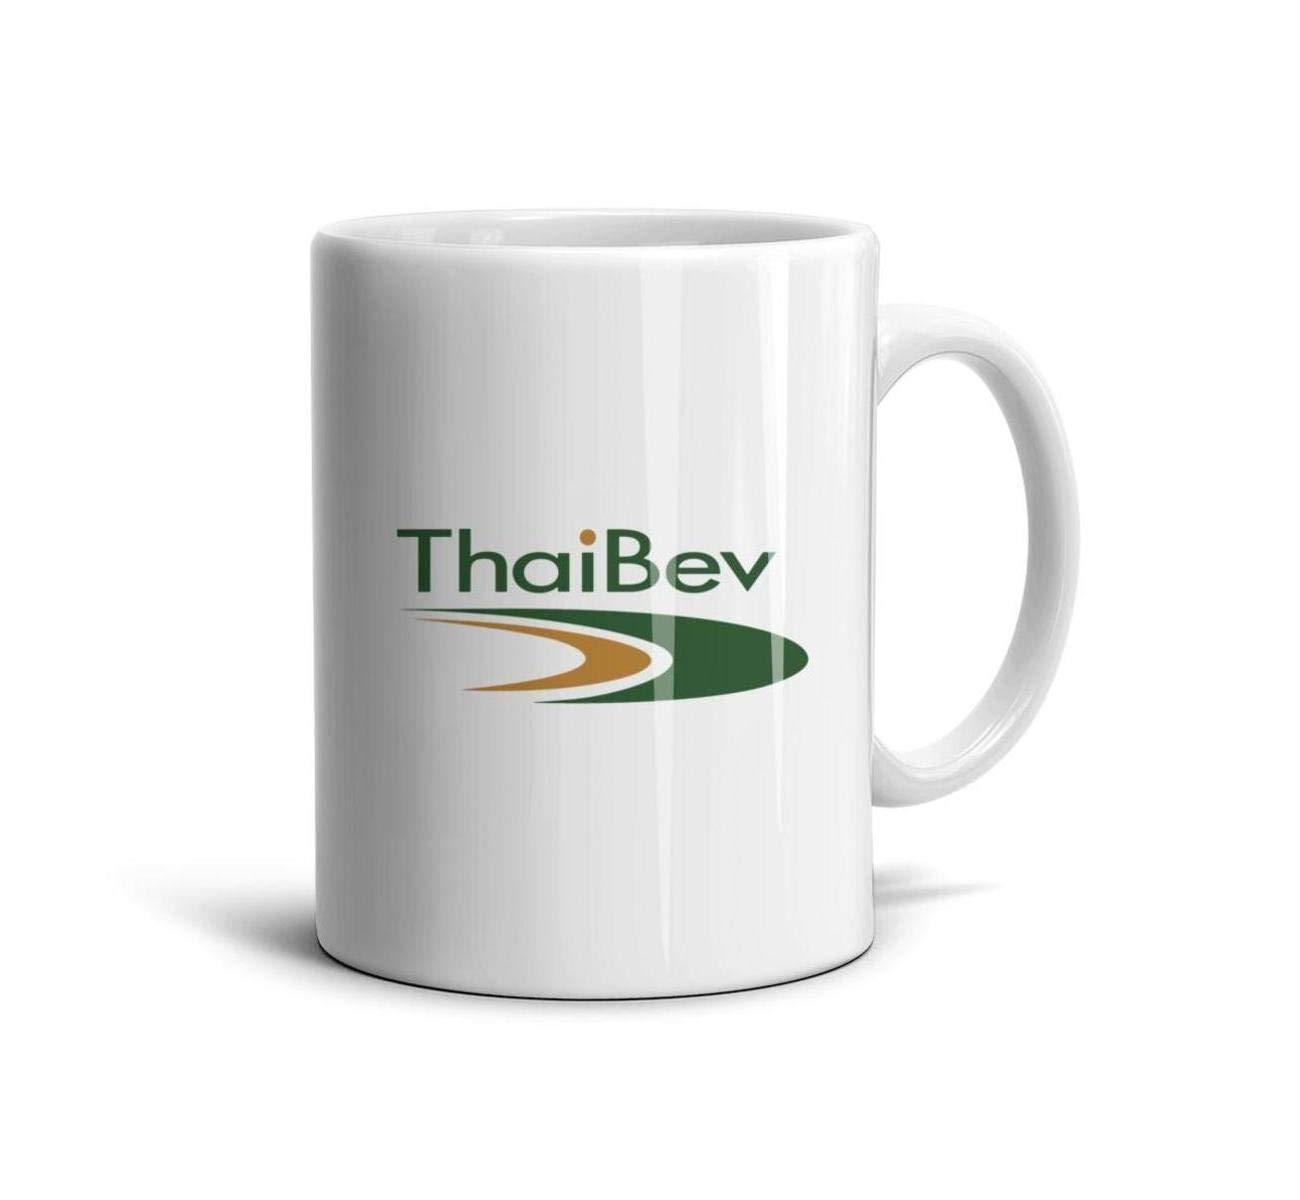 HIYITUTA Thaibev-Logo Mug Funny Motivational Mug 11 Oz Office Mugs Friends Wife